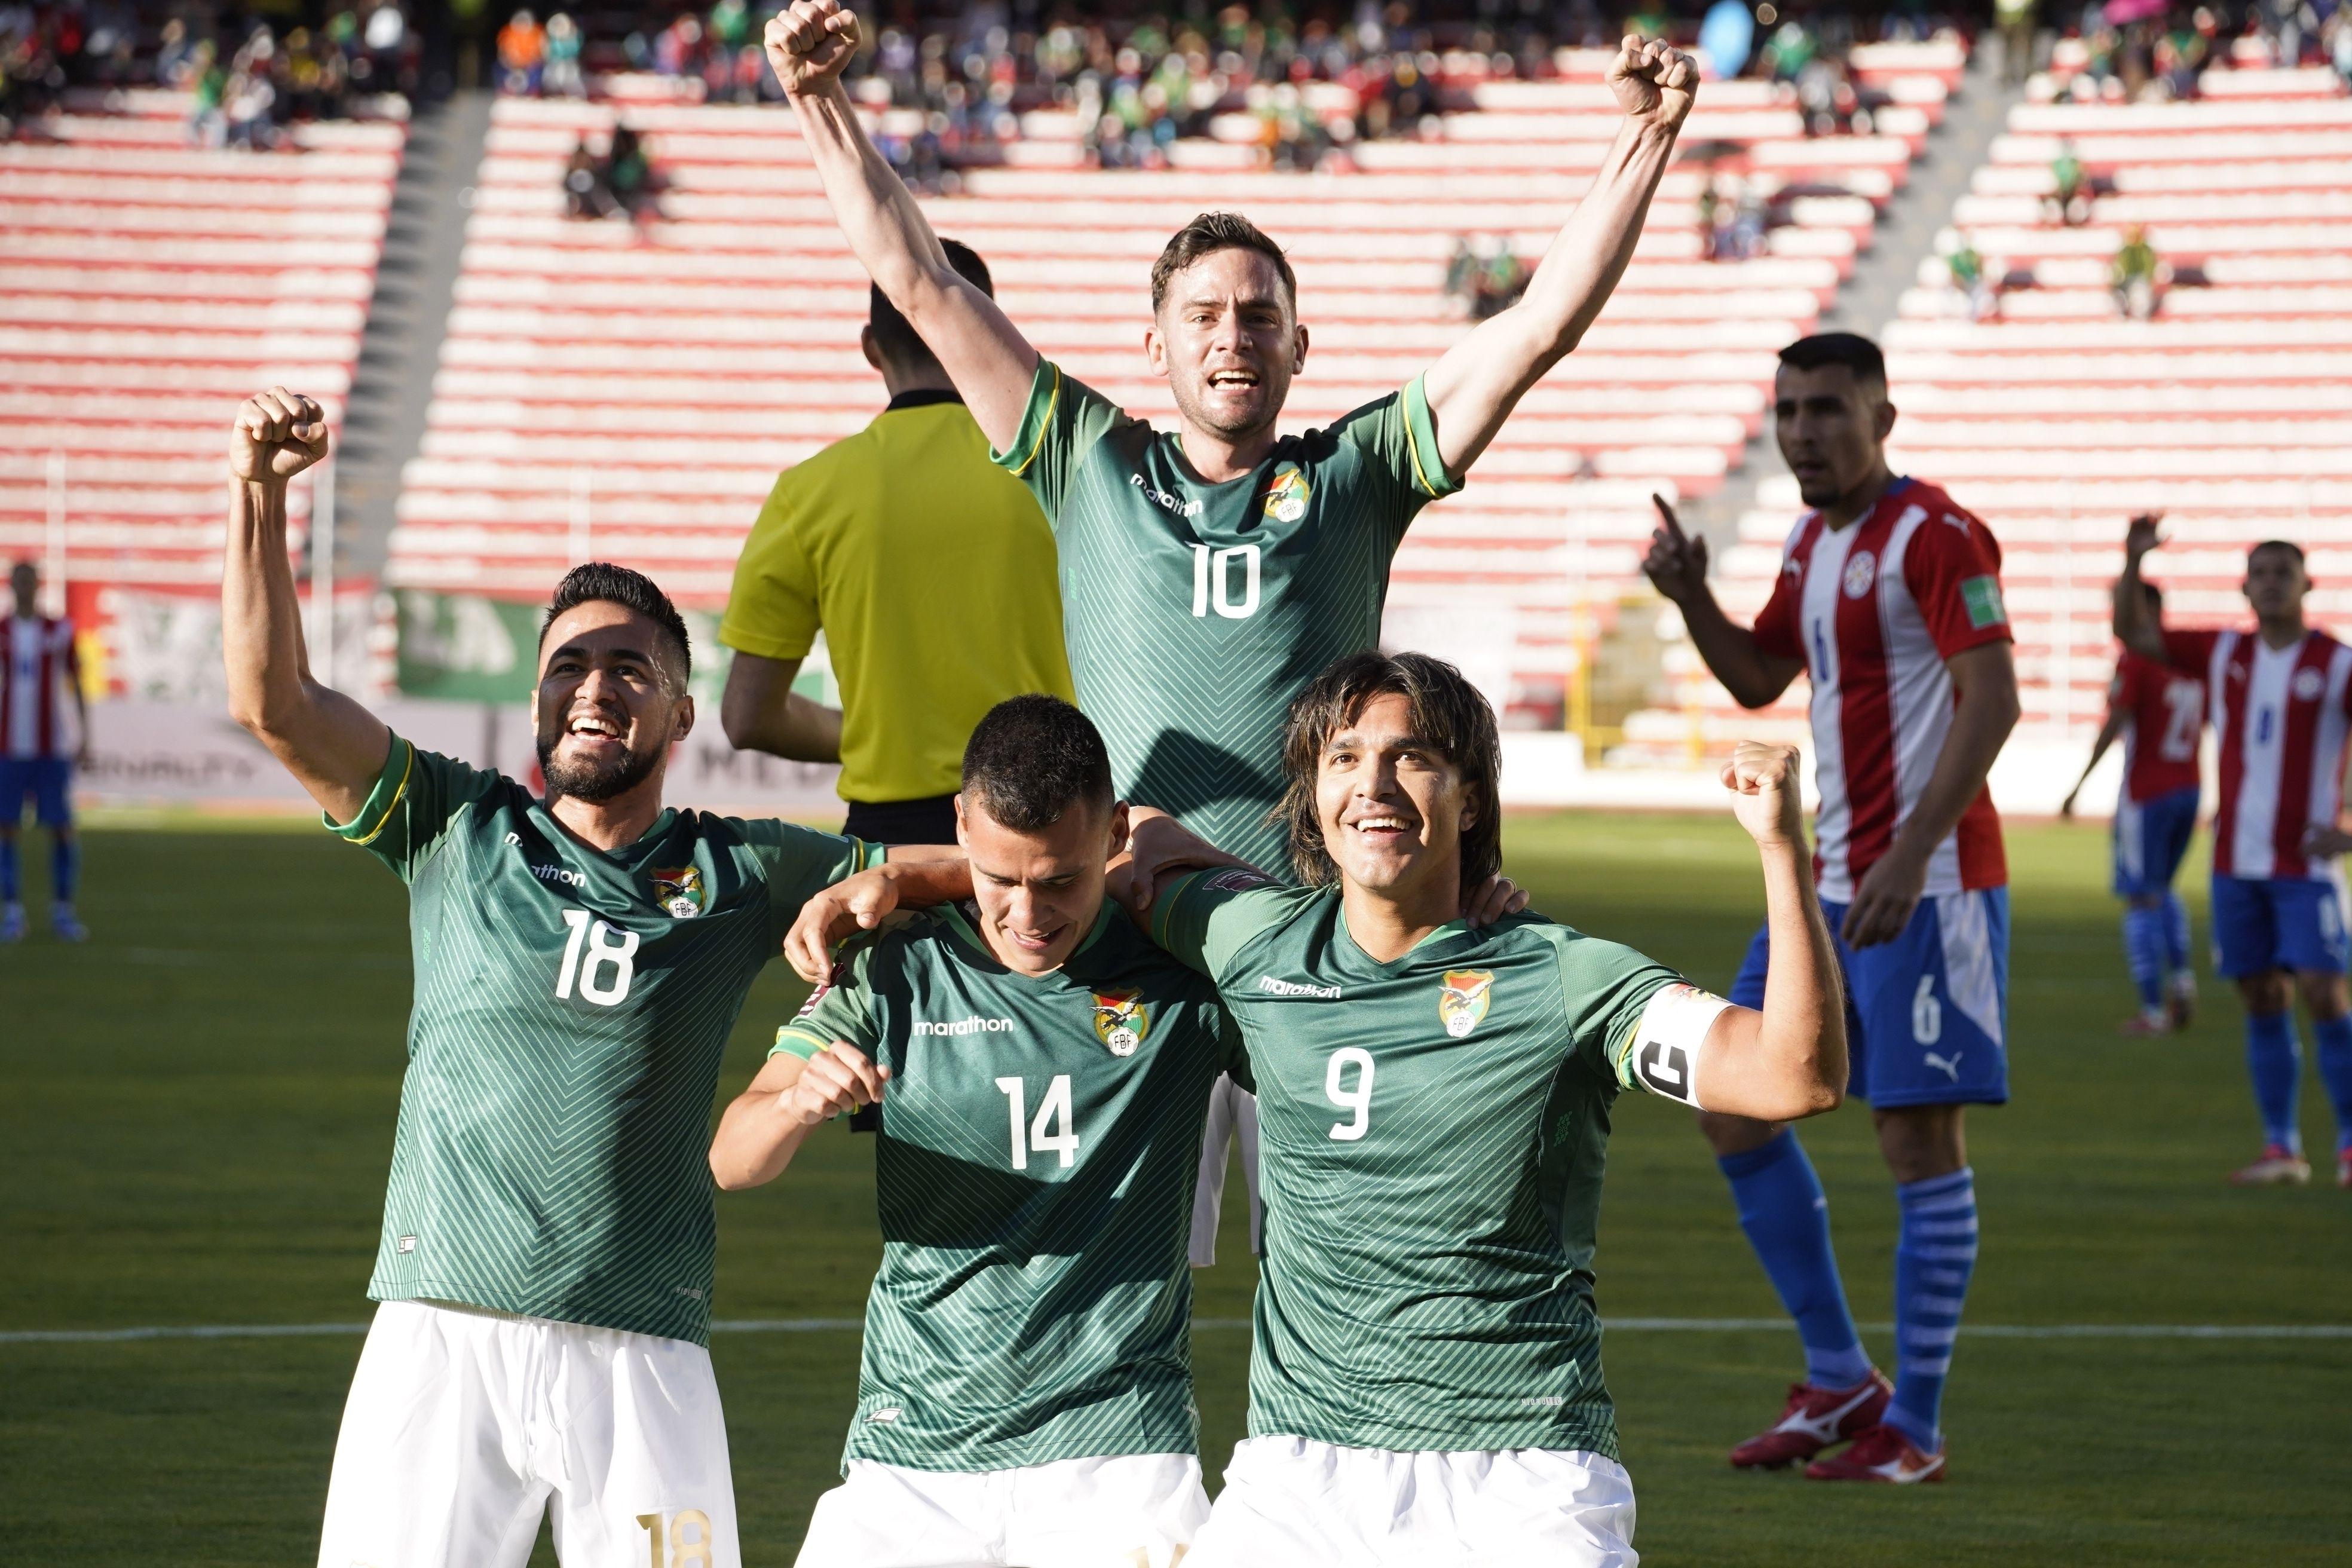 bolivia liquida 4-0 a paraguay y lo aleja de qatar